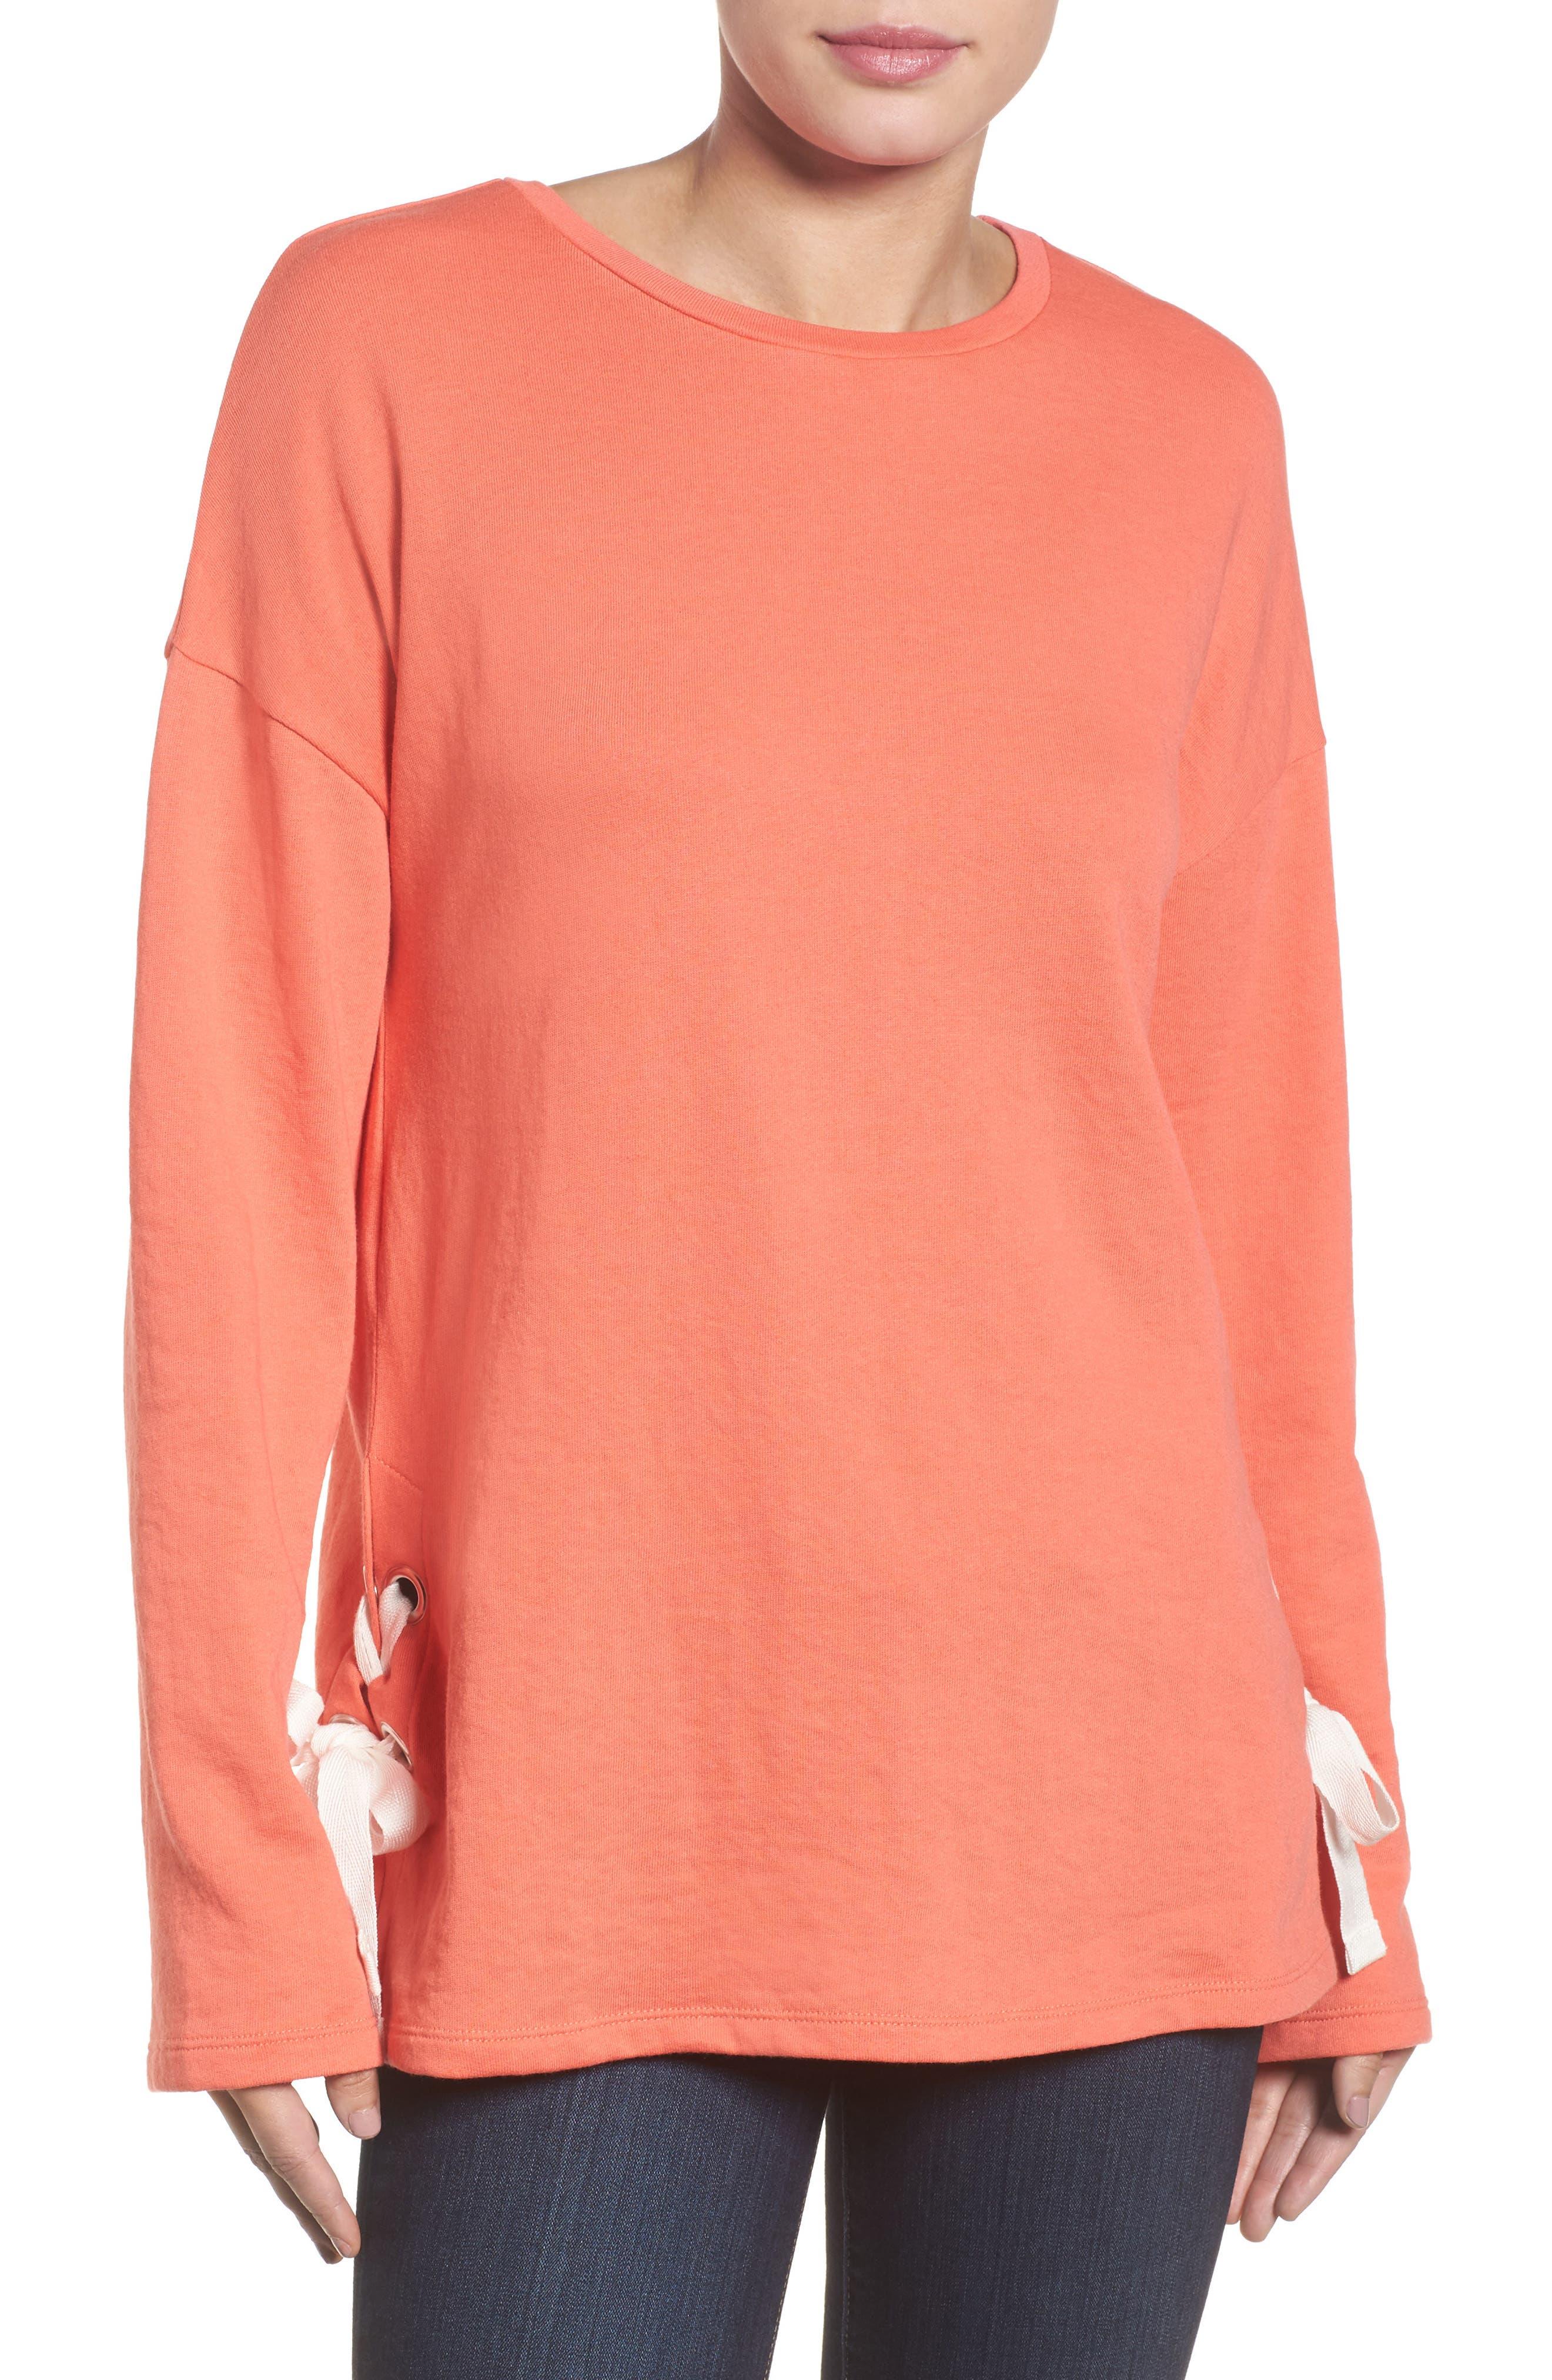 Main Image - Caslon® Lace-Up Side Sweatshirt (Regular & Petite)